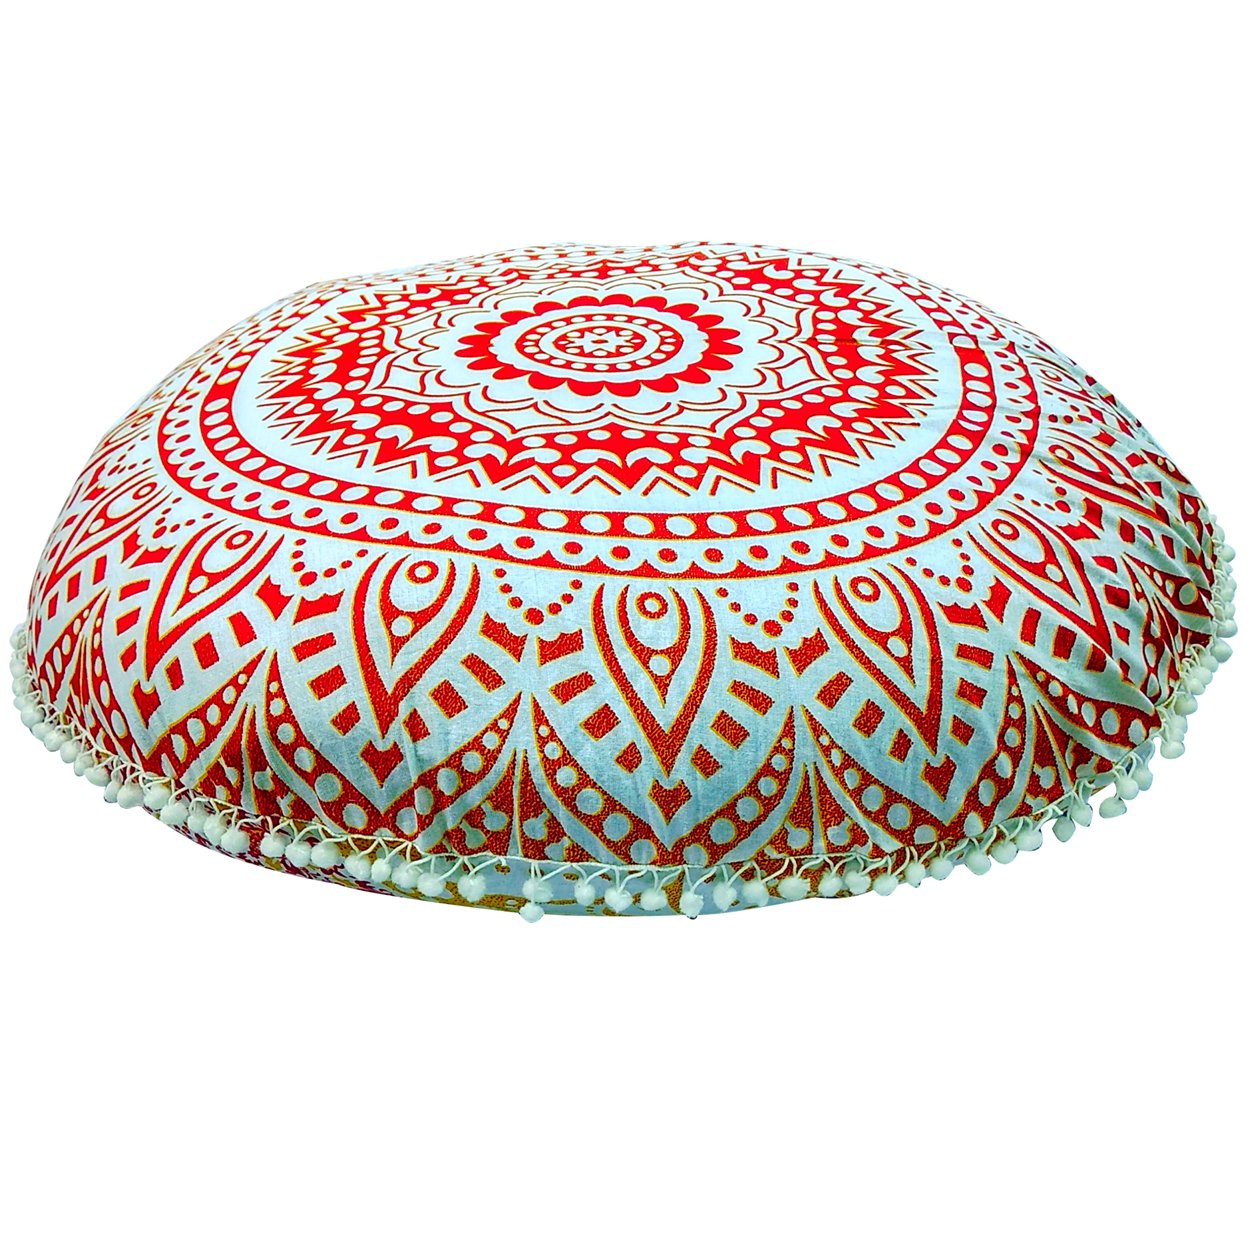 Pouf Cover Mandala Floor Pillow Comfortable Round Bohemian Cushion Cover Ottoman Mandala Floor Pillows